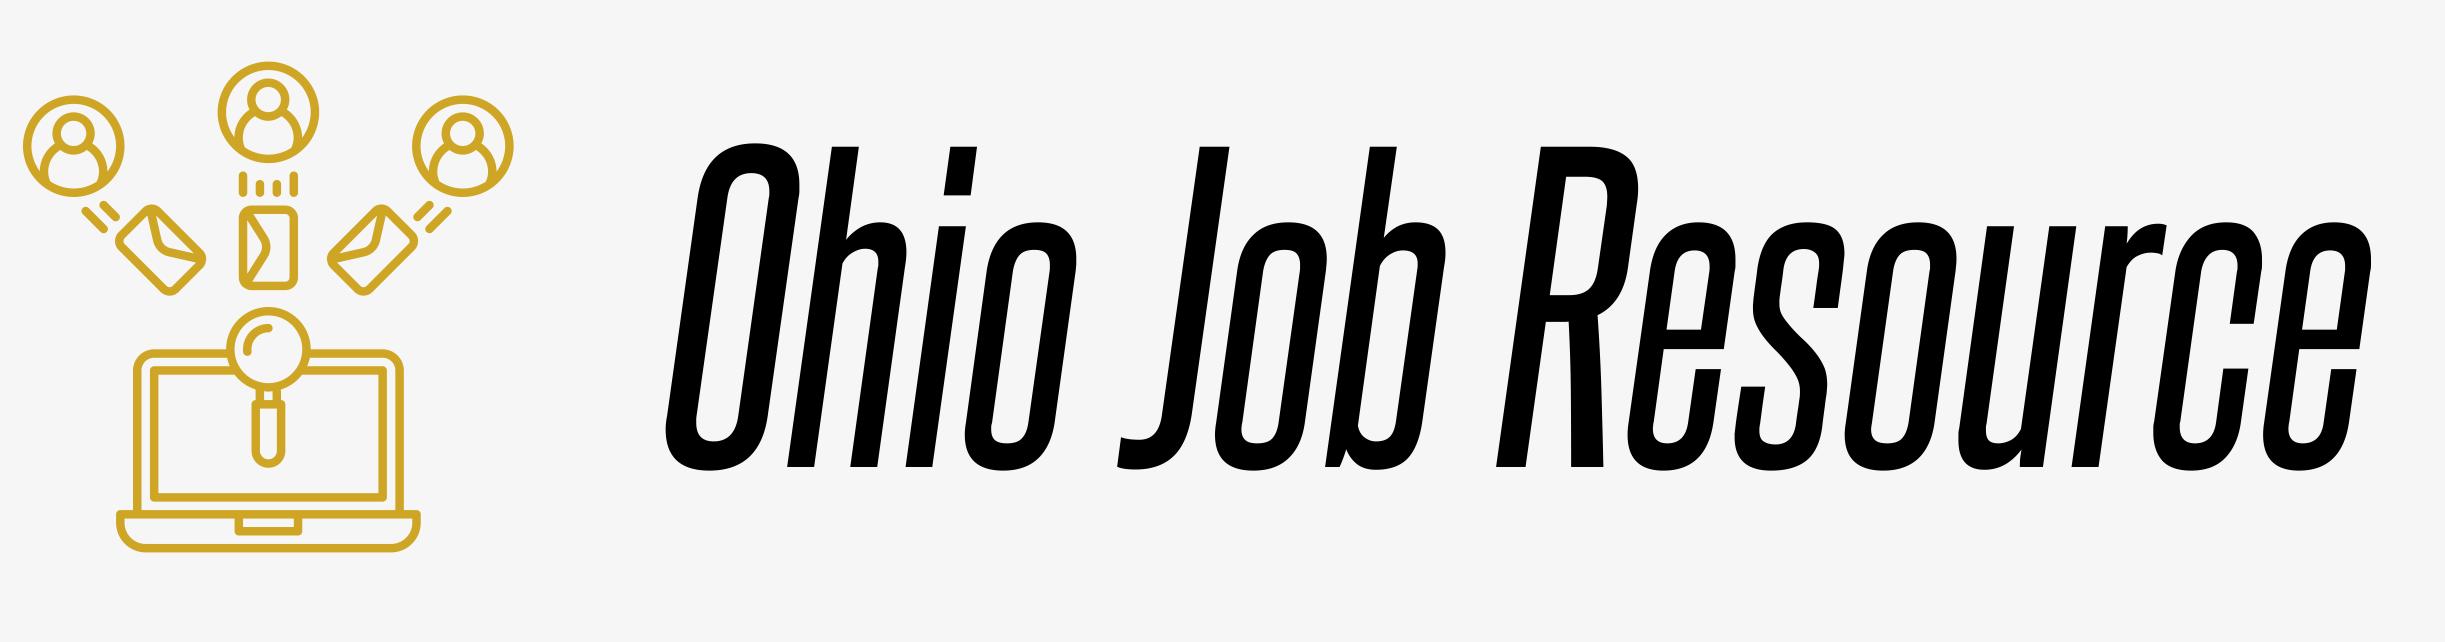 Job Resource in Ohio